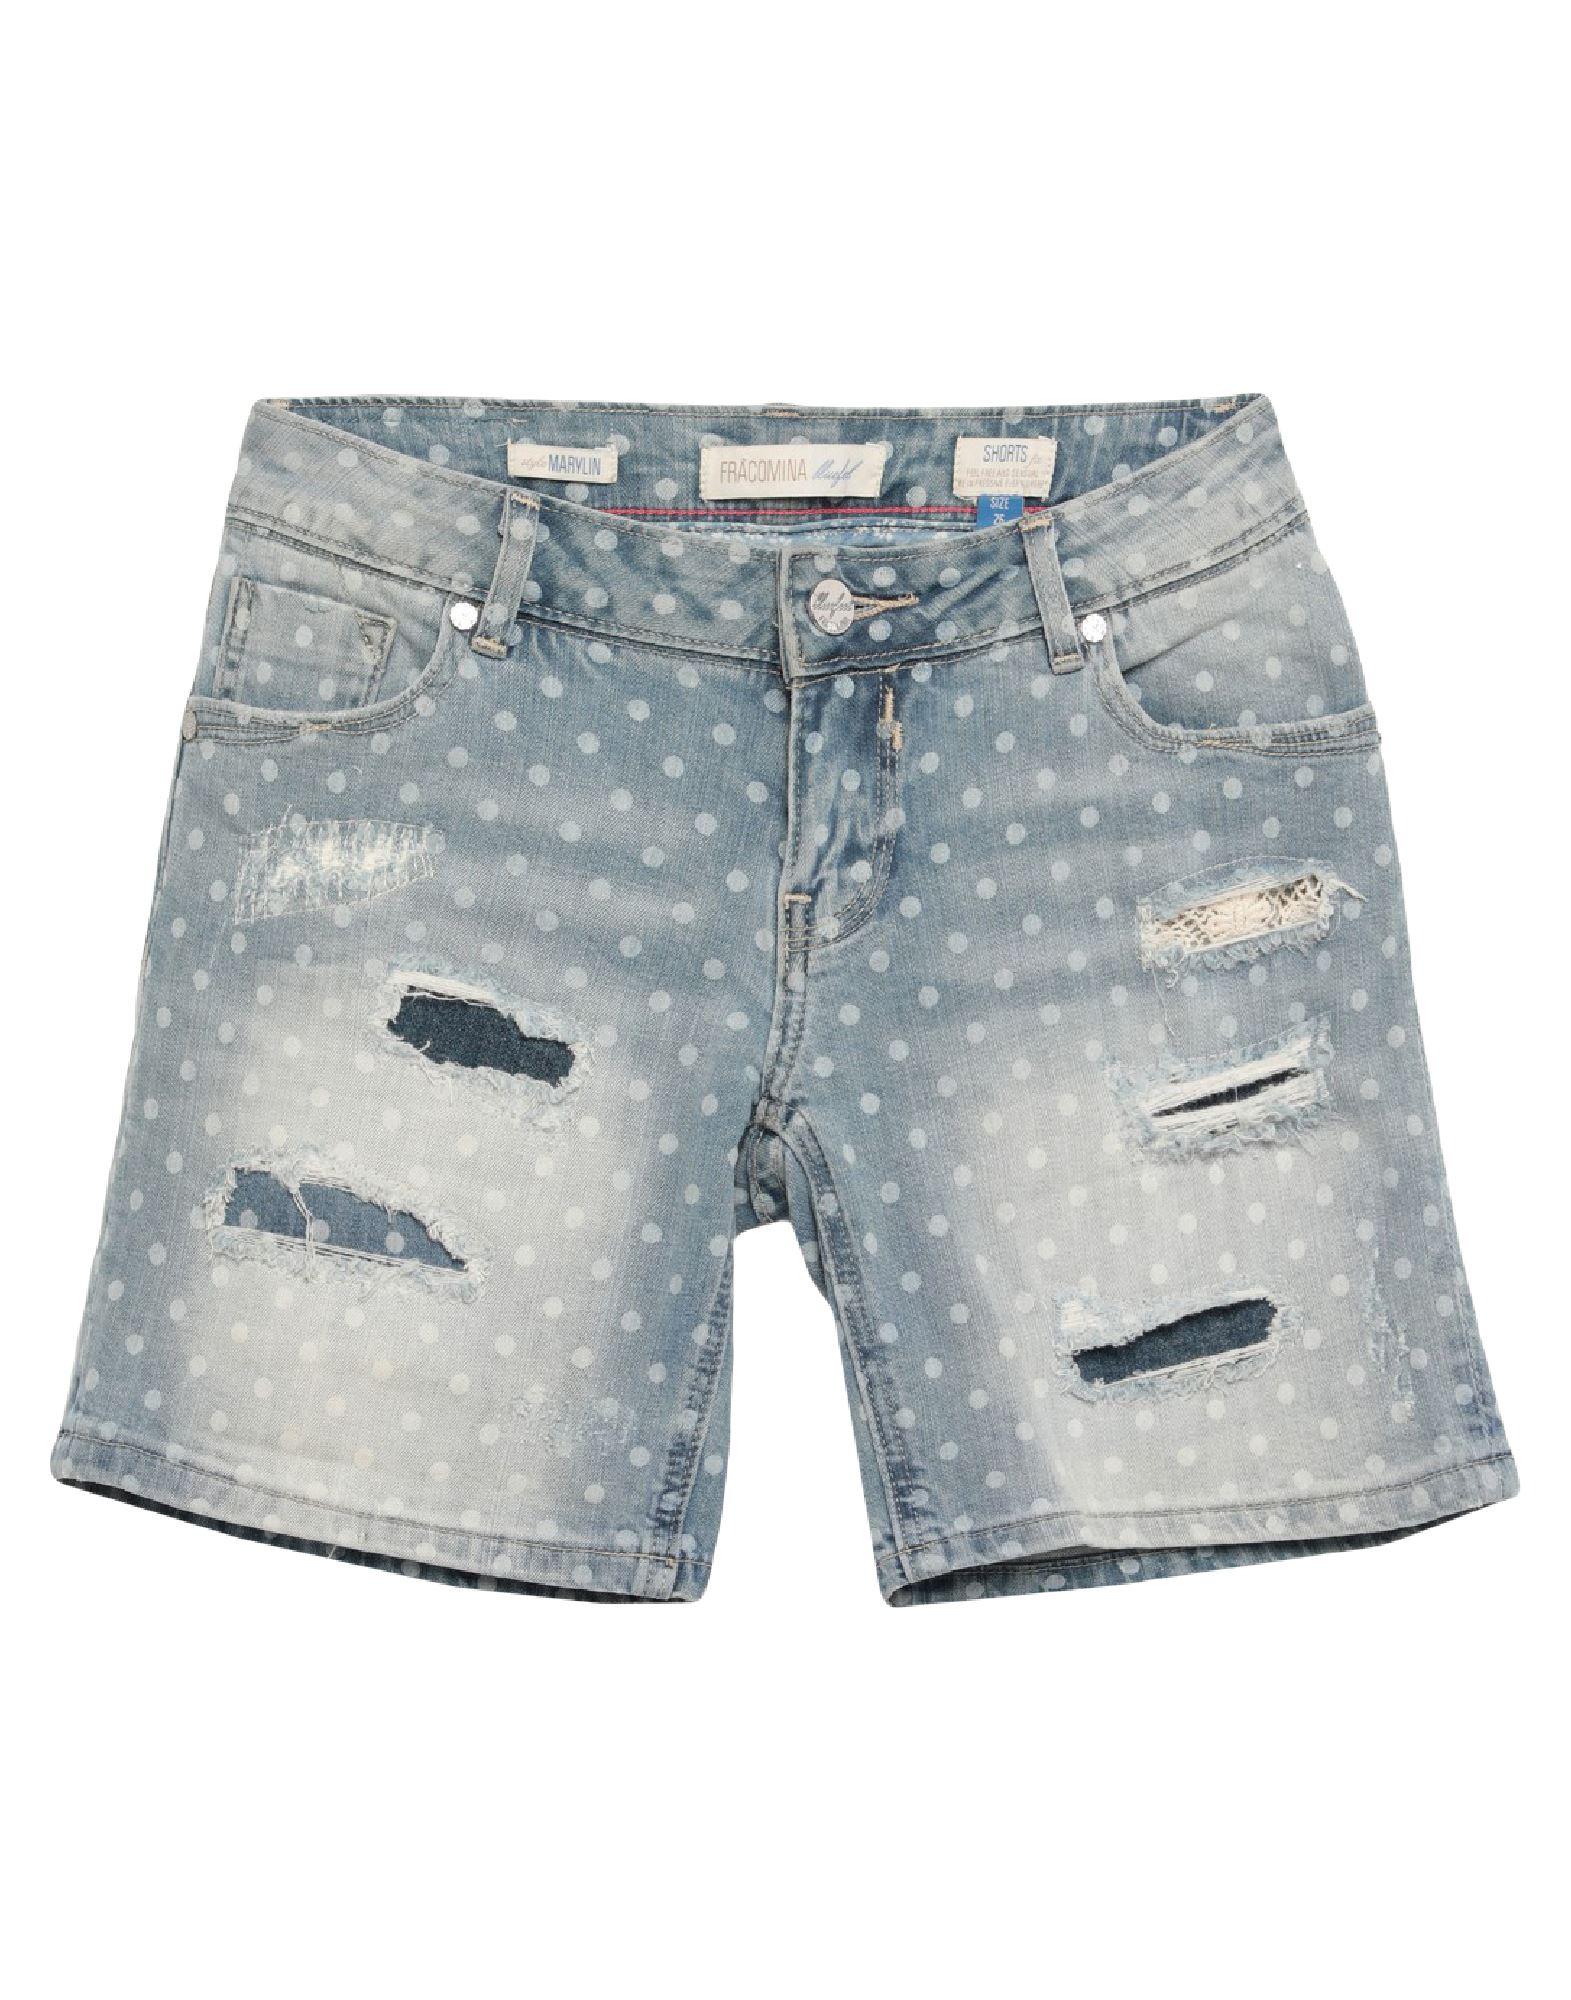 BLUEFEEL by FRACOMINA Джинсовые шорты fracomina mini джинсовые шорты